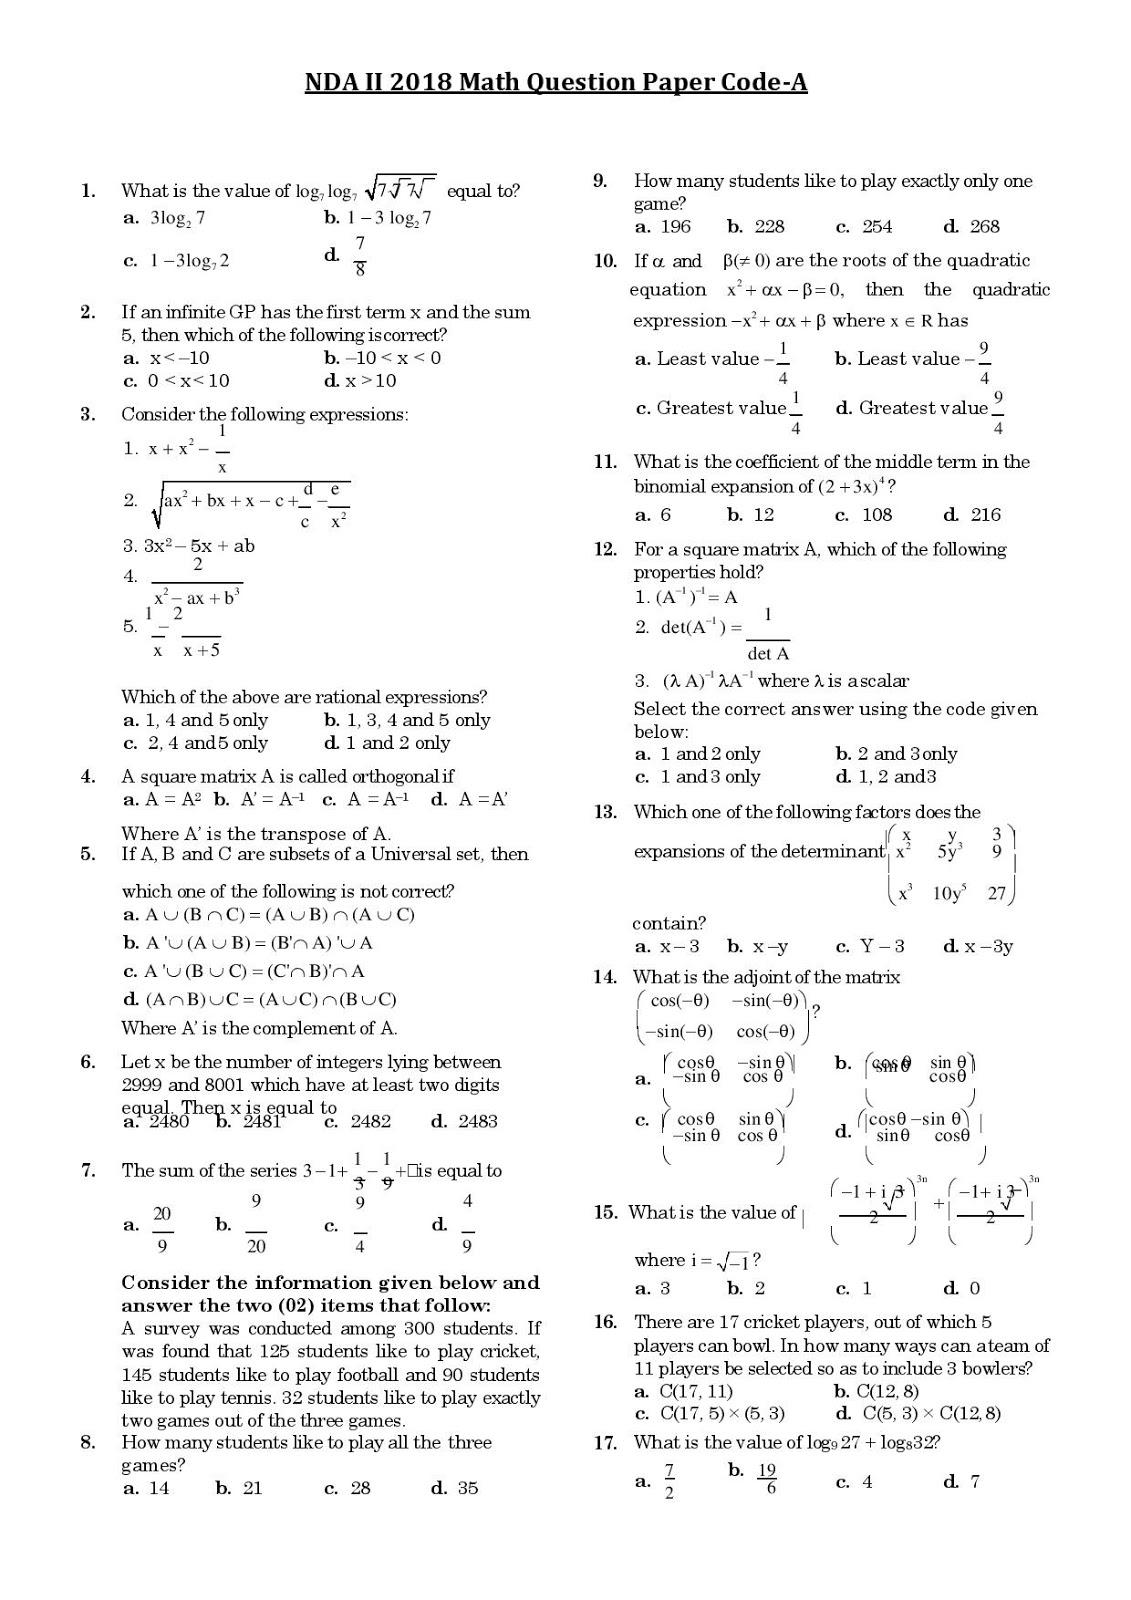 Maths Question Paper of NDA & NA II 2018 Download PDF